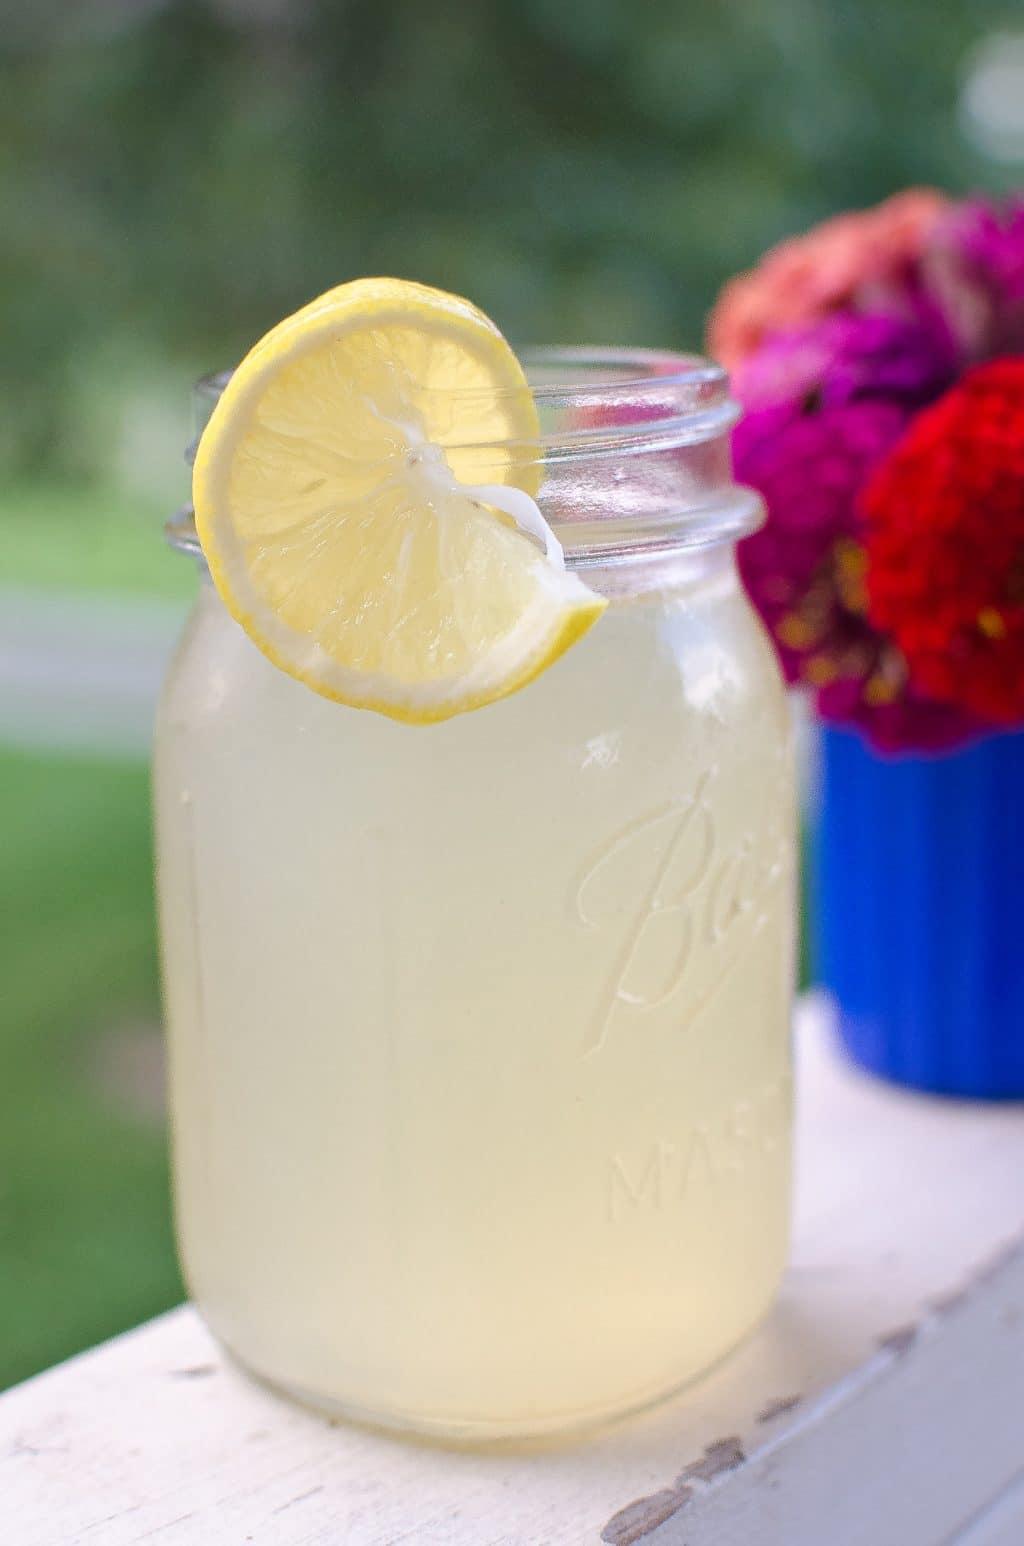 Sold Price: Antique Victorian Lemonade Set Pitcher 6 ... |Real Pitcher Of Lemonade